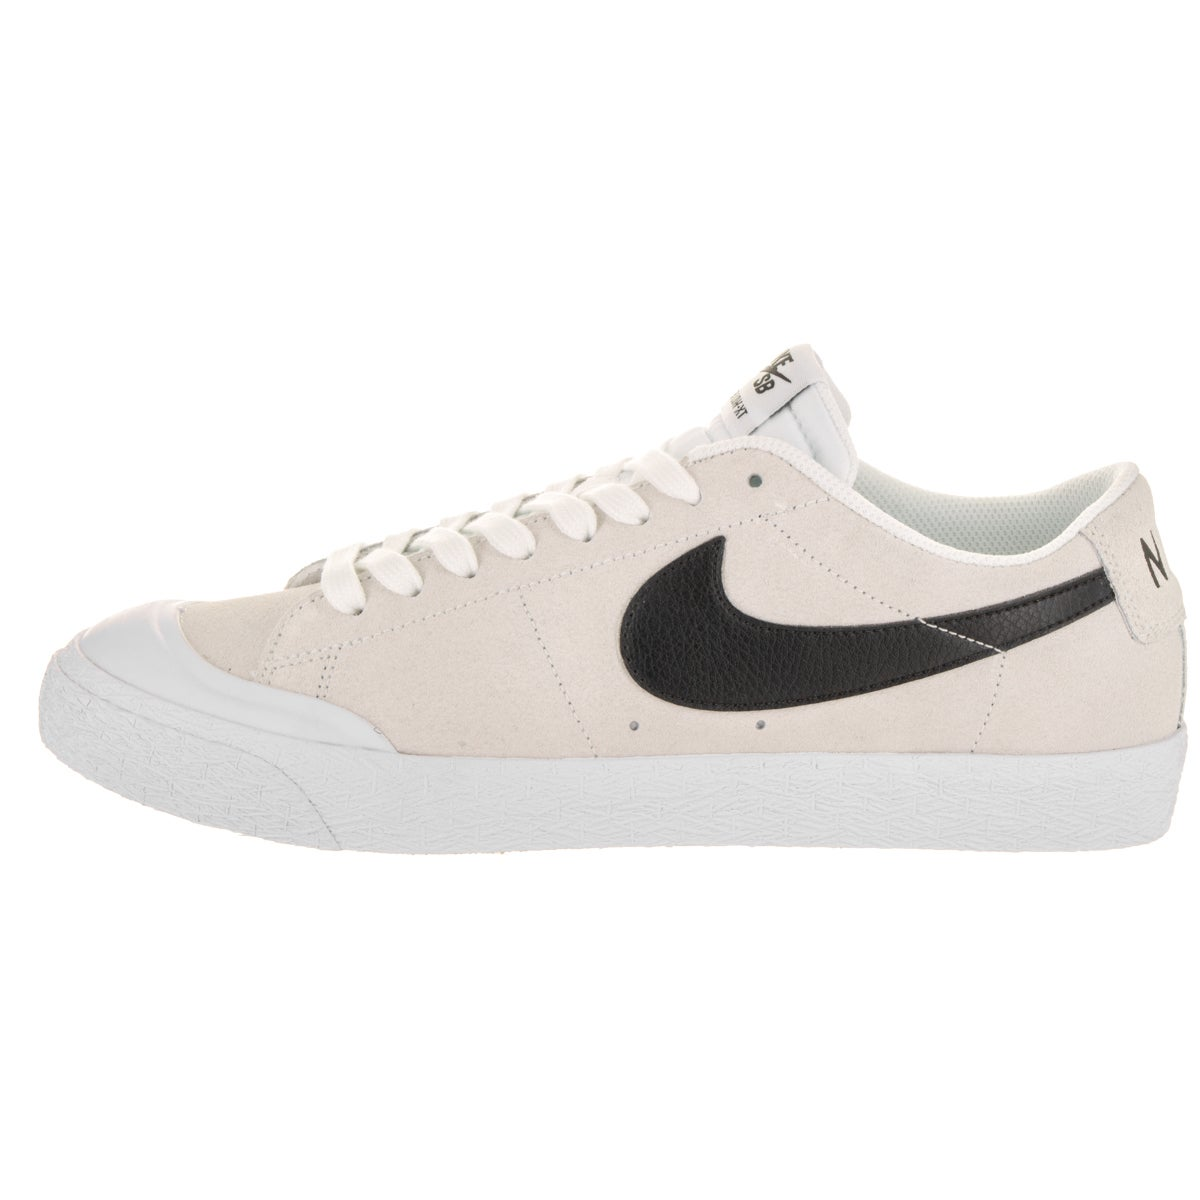 7f3008ce41b37 Shop Nike Men s SB Blazer Zoom Low XT Skate Shoe - Free Shipping Today -  Overstock - 14055622